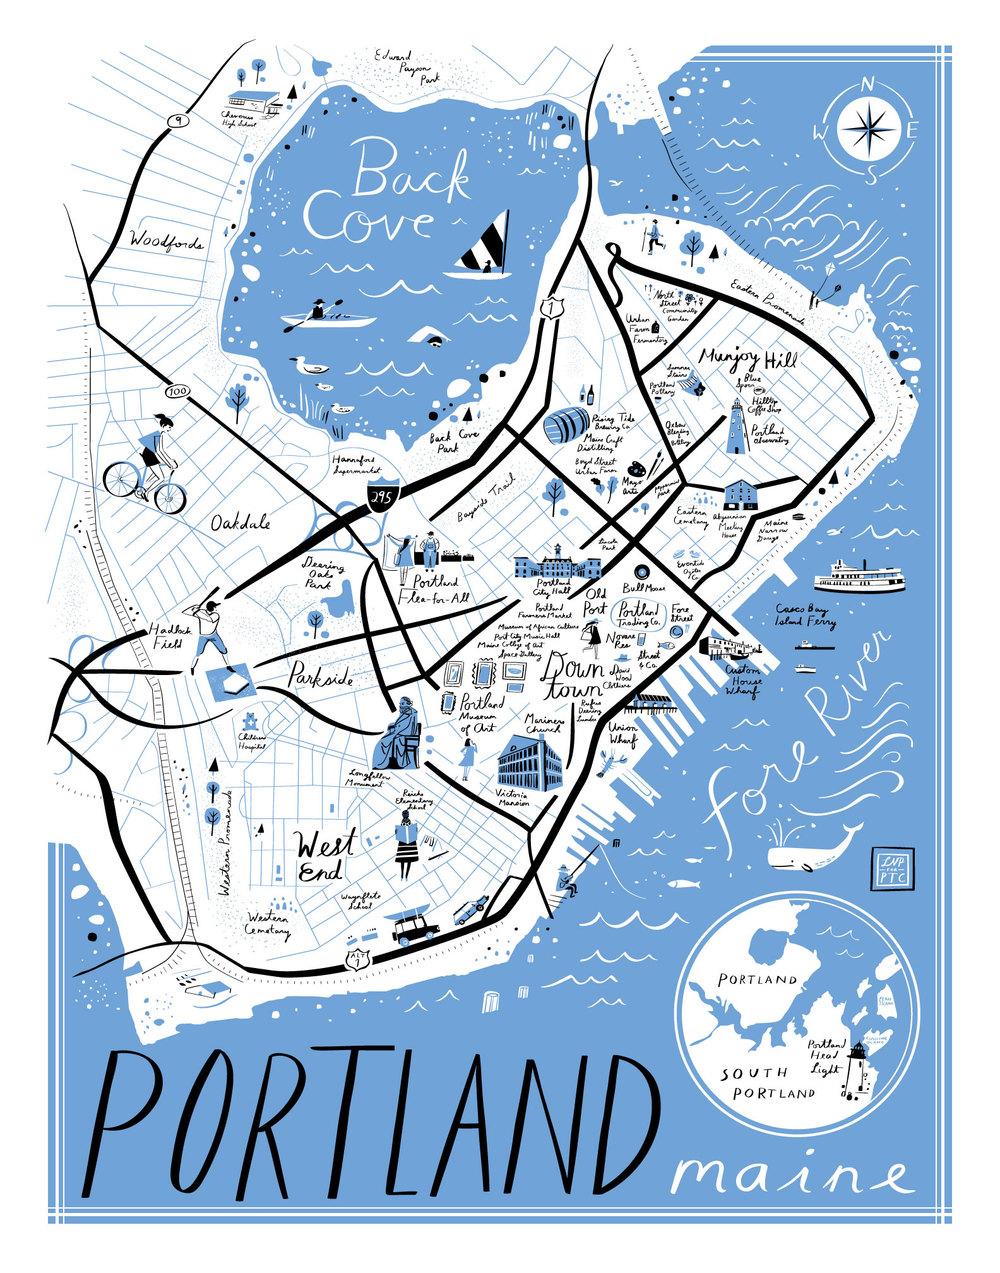 Maps Portland Maine Portland Maine Map — Libby VanderPloeg